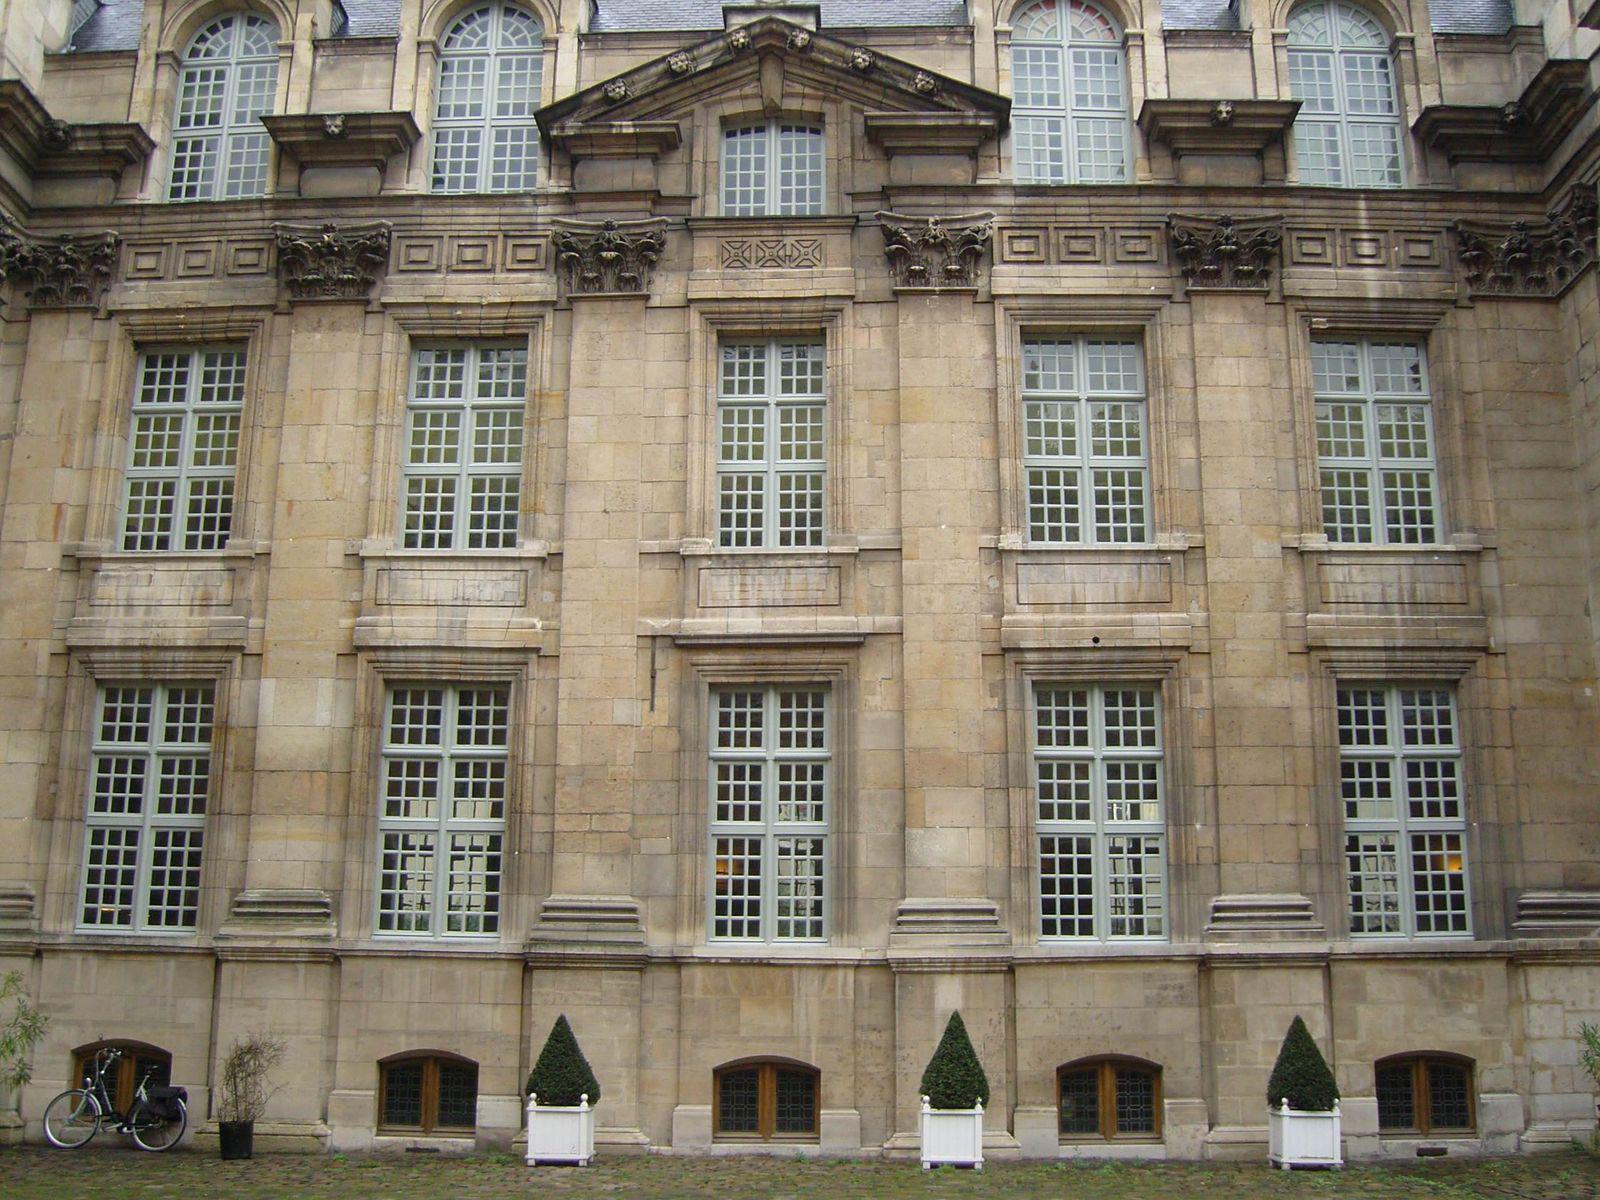 H tel de lamoignon paris 75000 paris 75 for Hotel paris 75